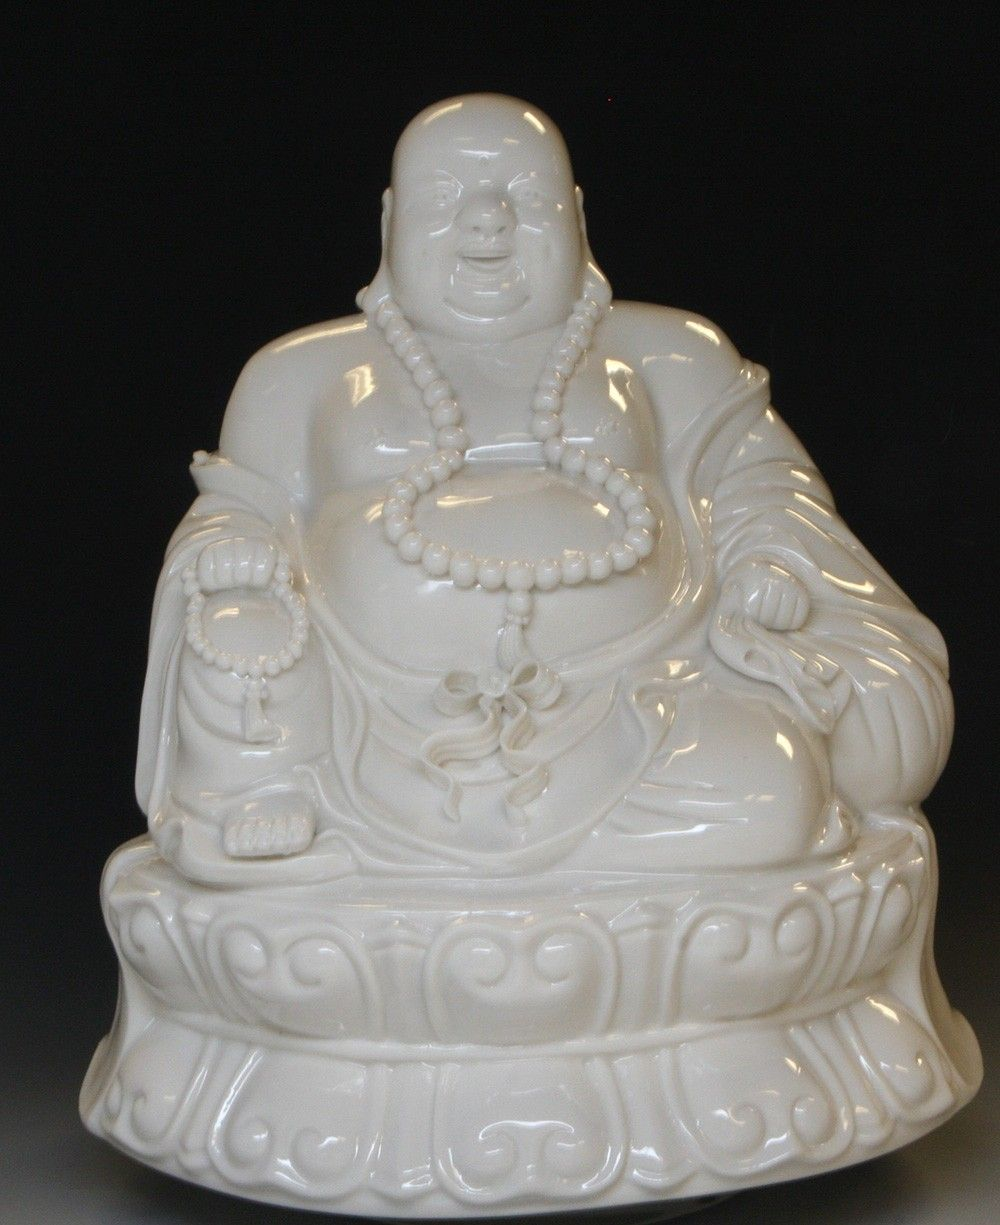 Porcelain happy buddha statue on beautifully detailed lotus base porcelain happy buddha statue on beautifully detailed lotus base symbolic of contentment and good fortune buycottarizona